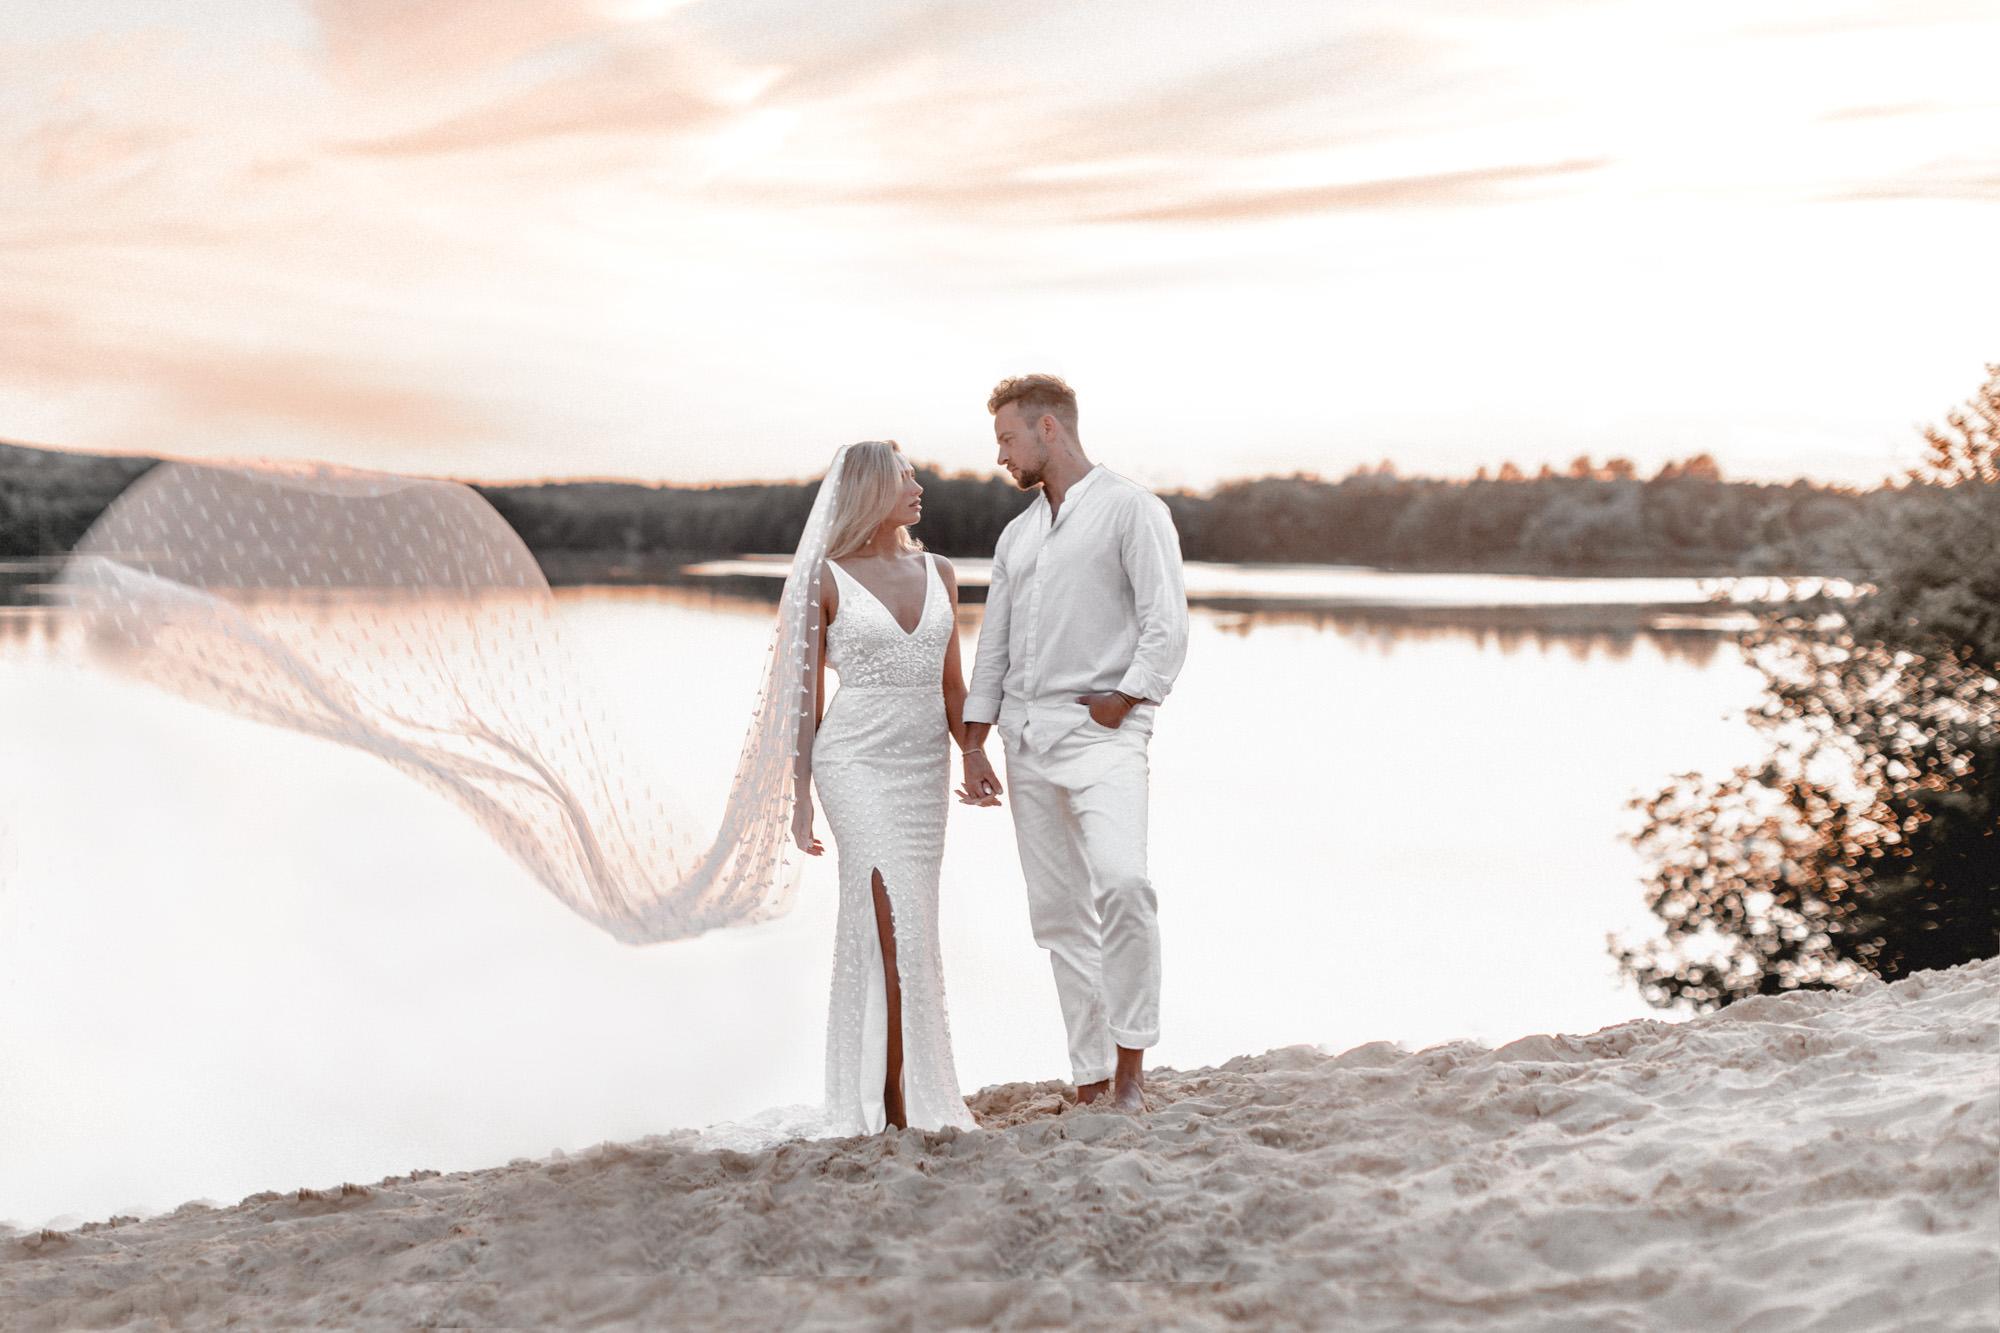 wedding-photographer-italy-europe-